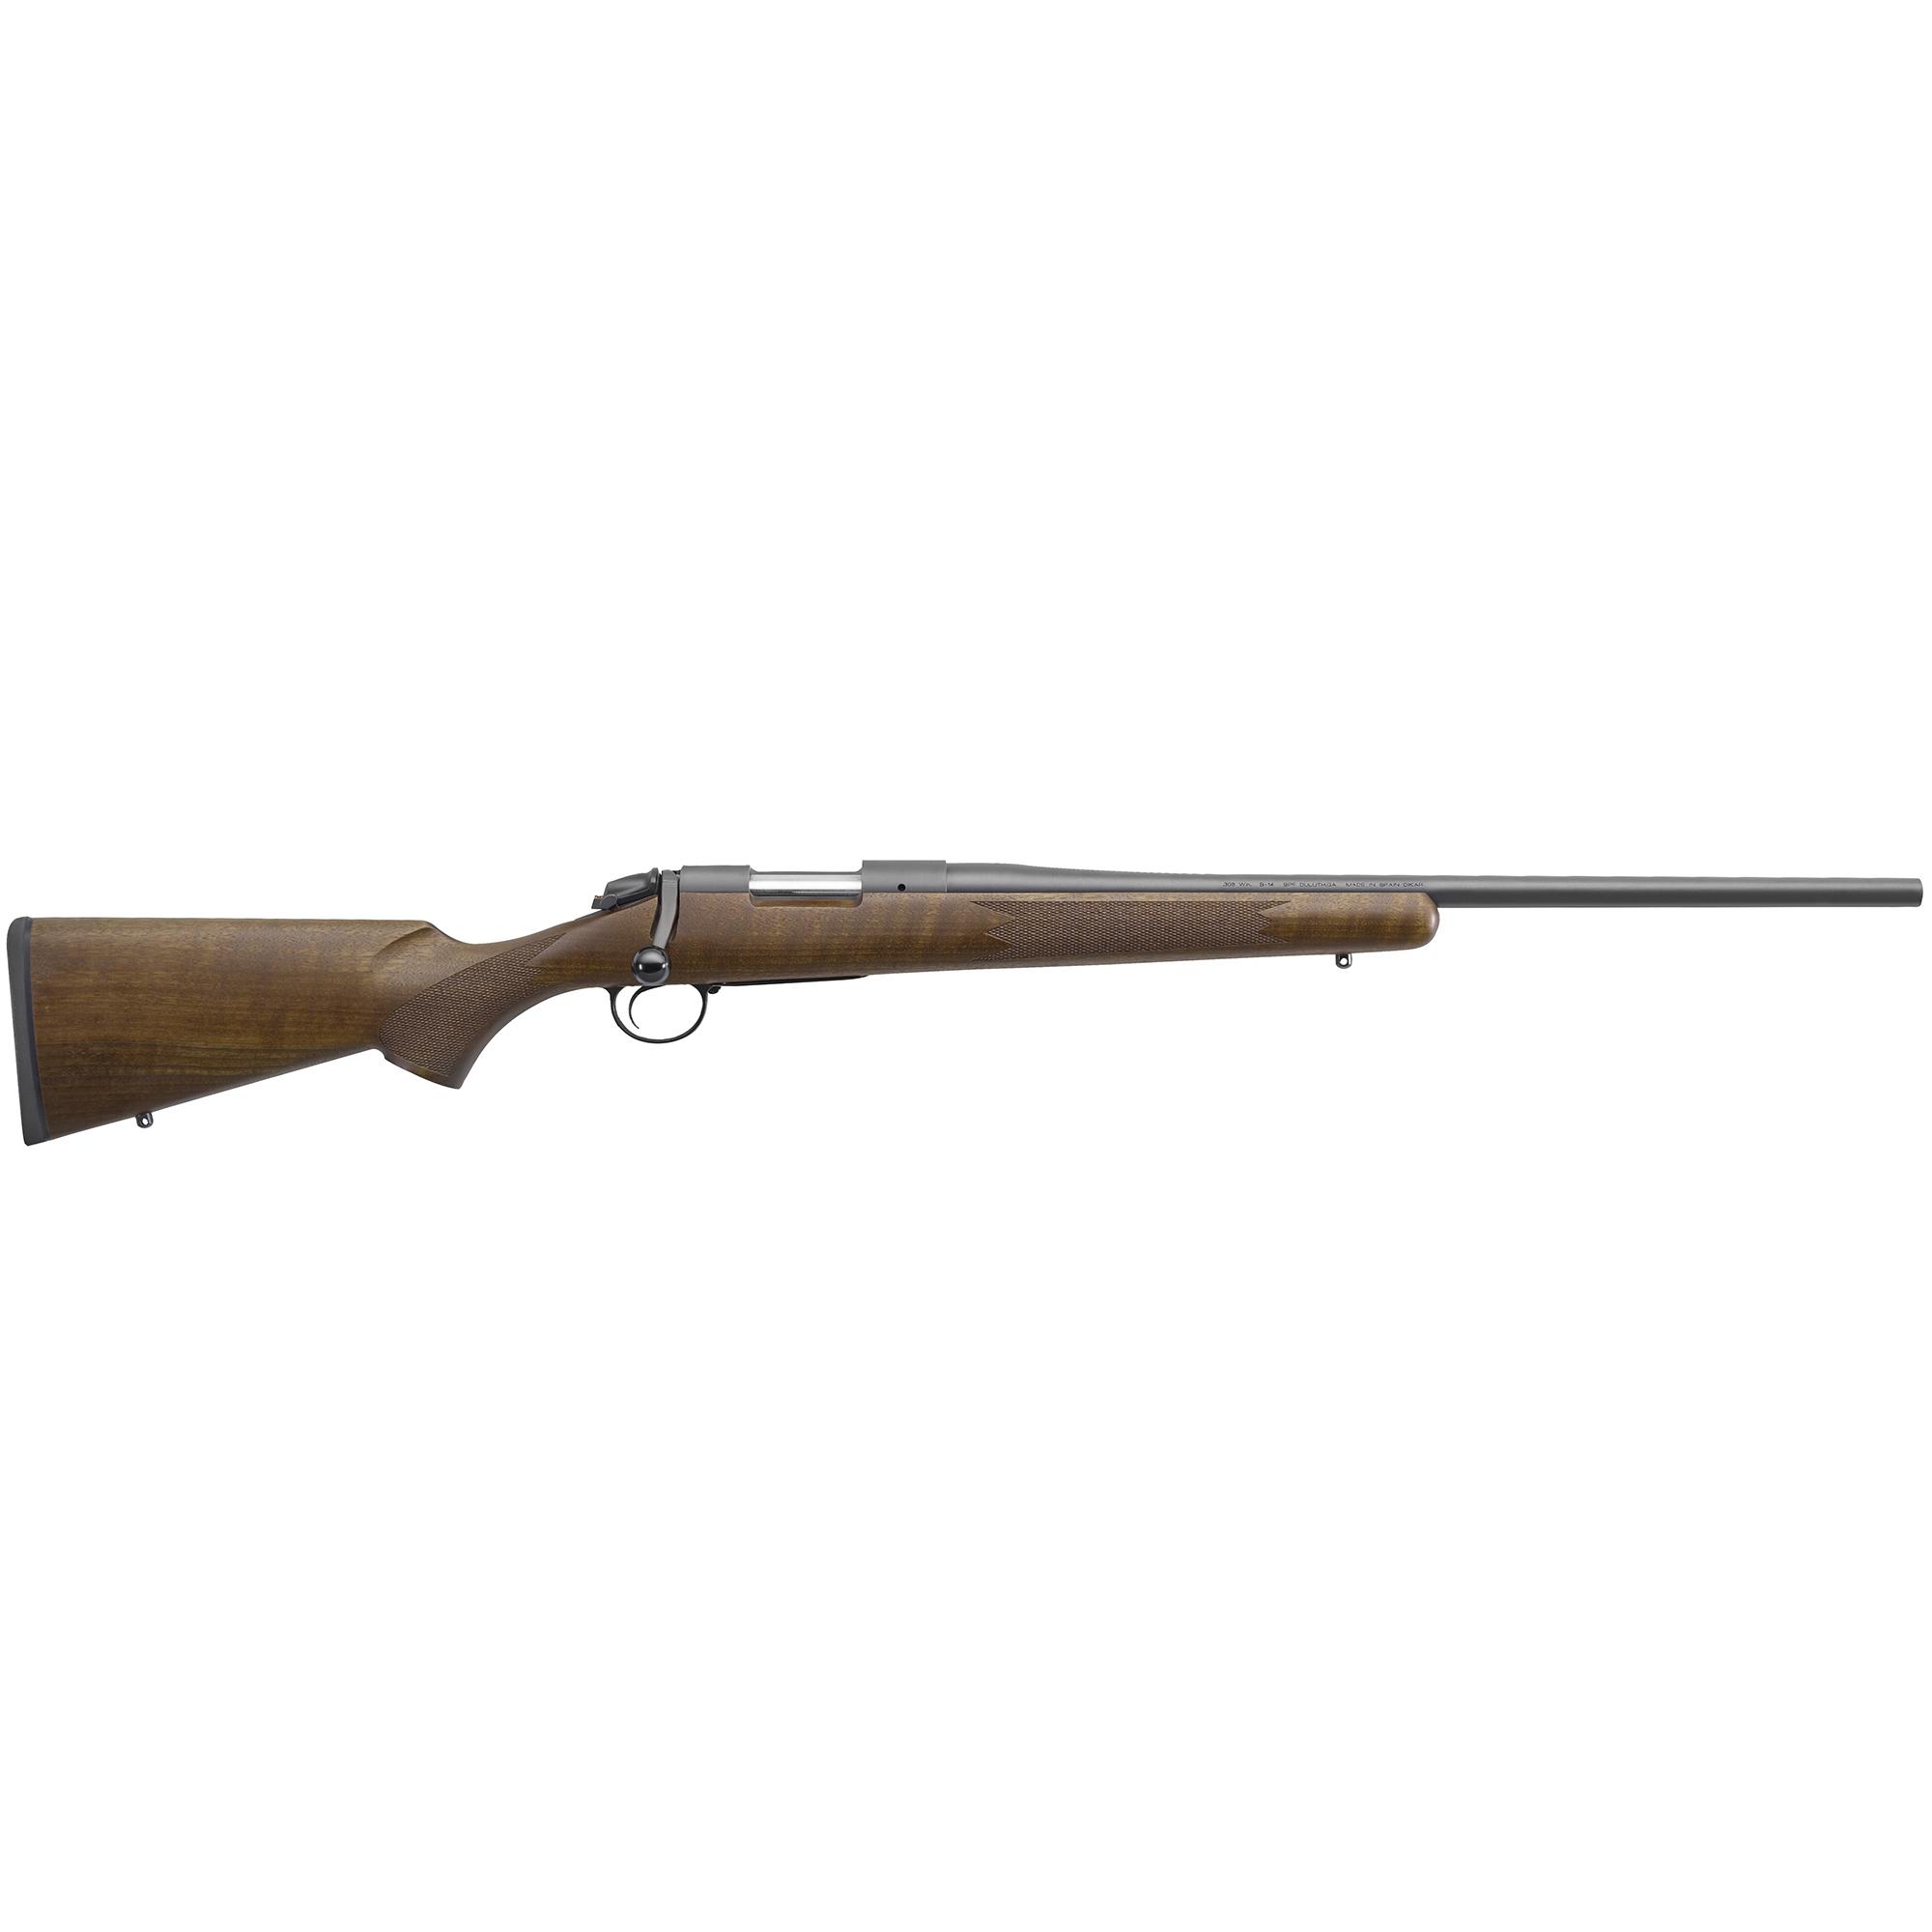 Bergara B-14 Woodsman Centerfire Rifle, .243 Win thumbnail